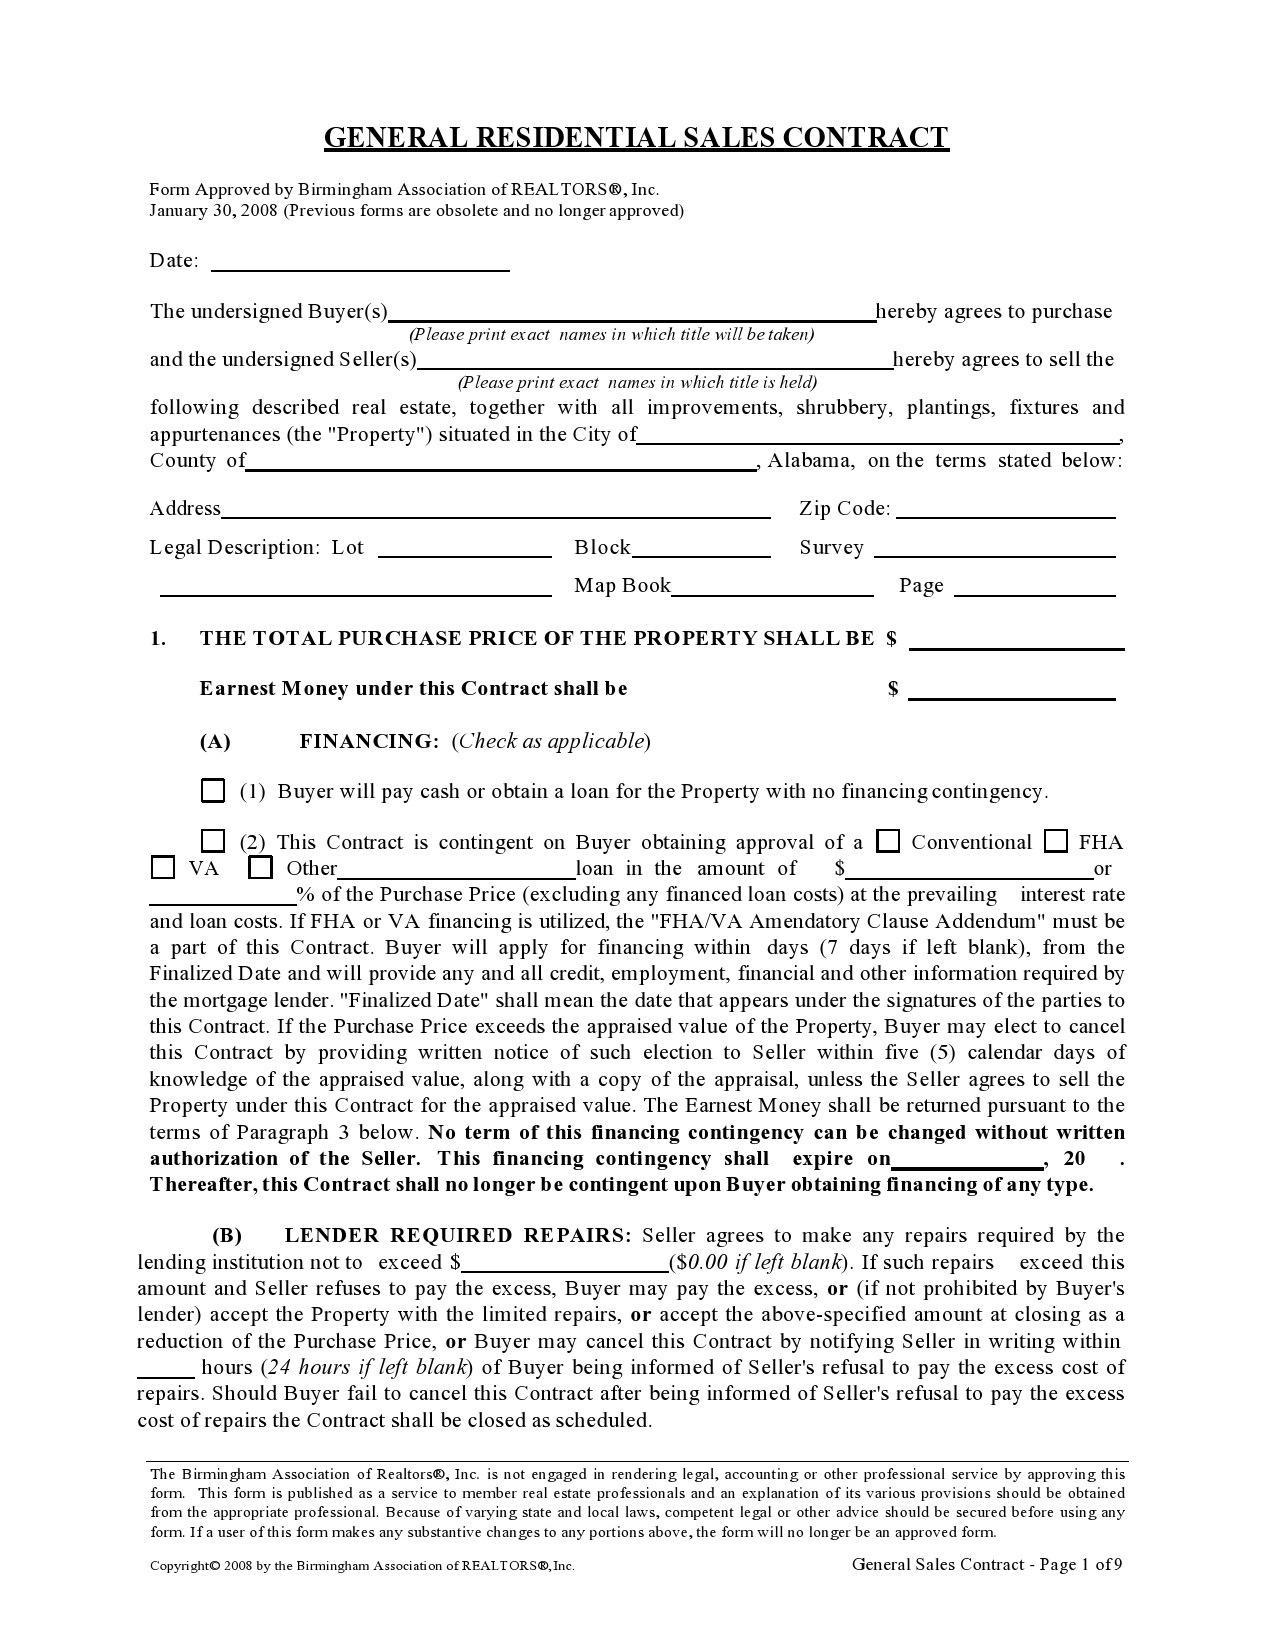 Free seller financing addendum 27